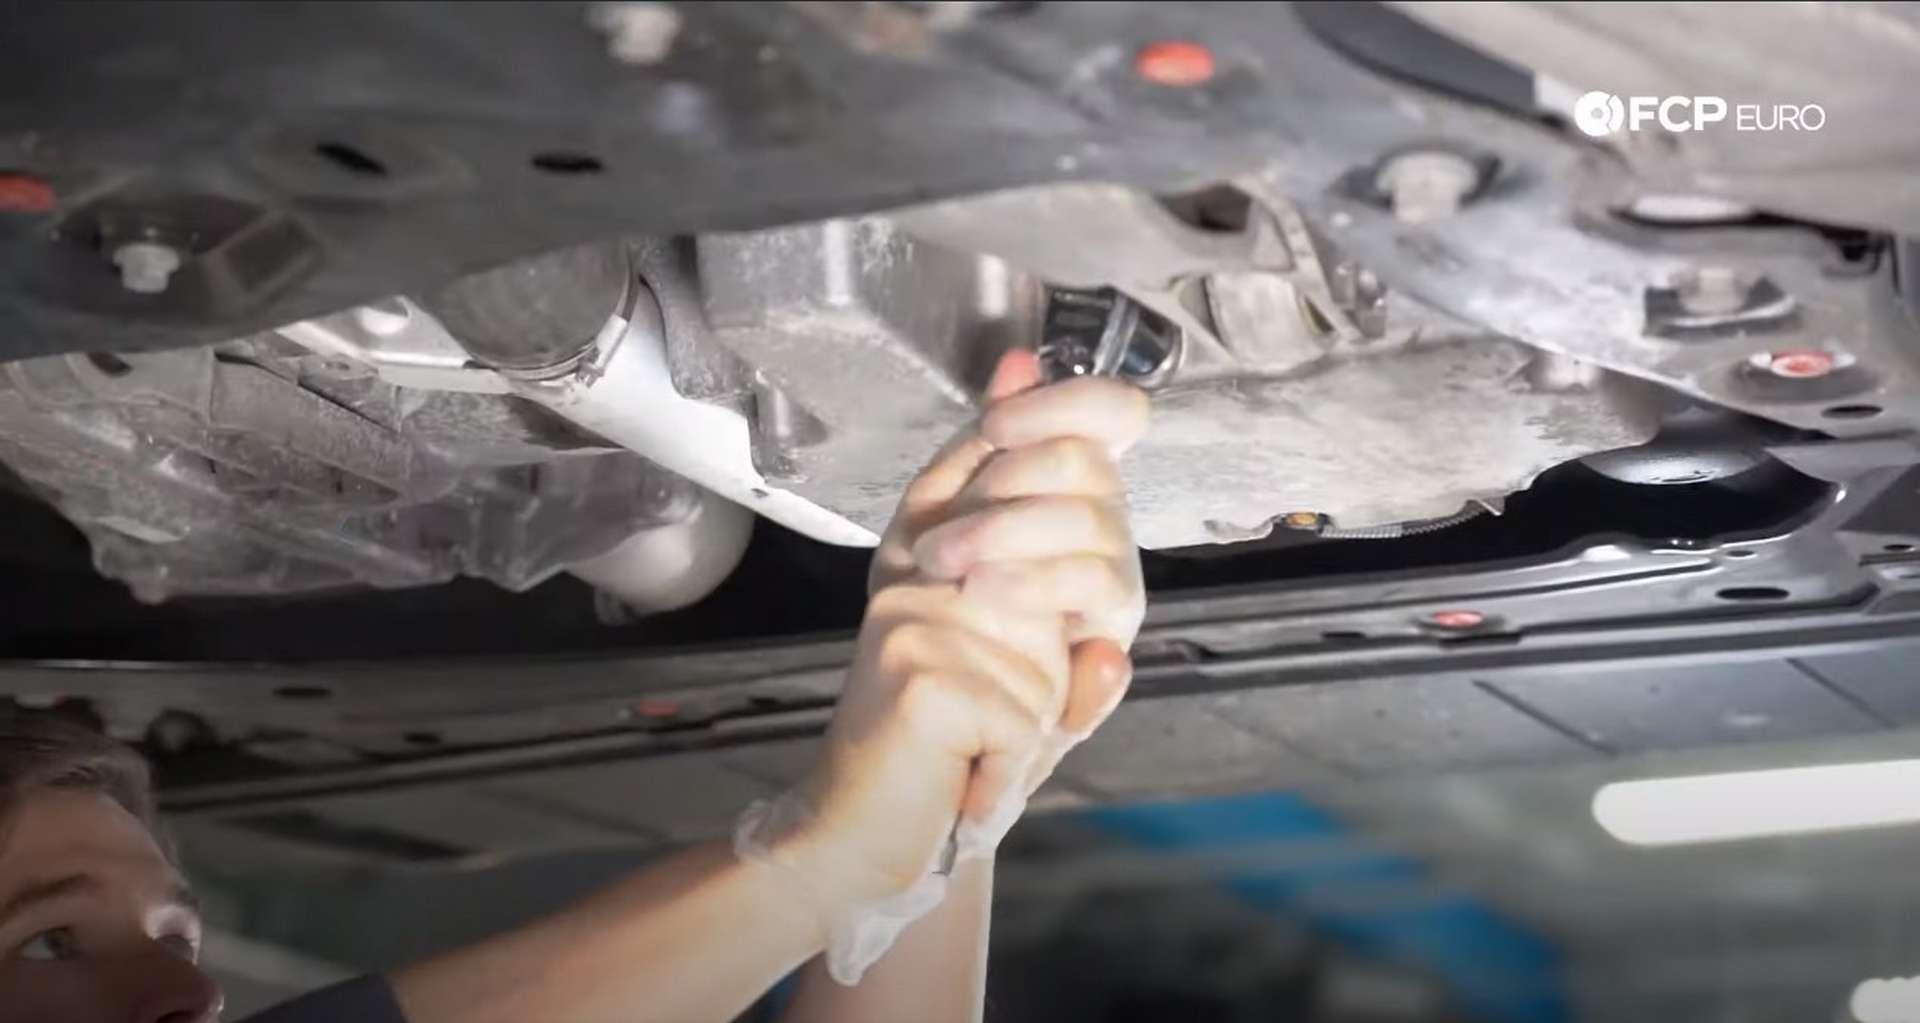 DIY Volvo SPA Oil Change removing the drain plug